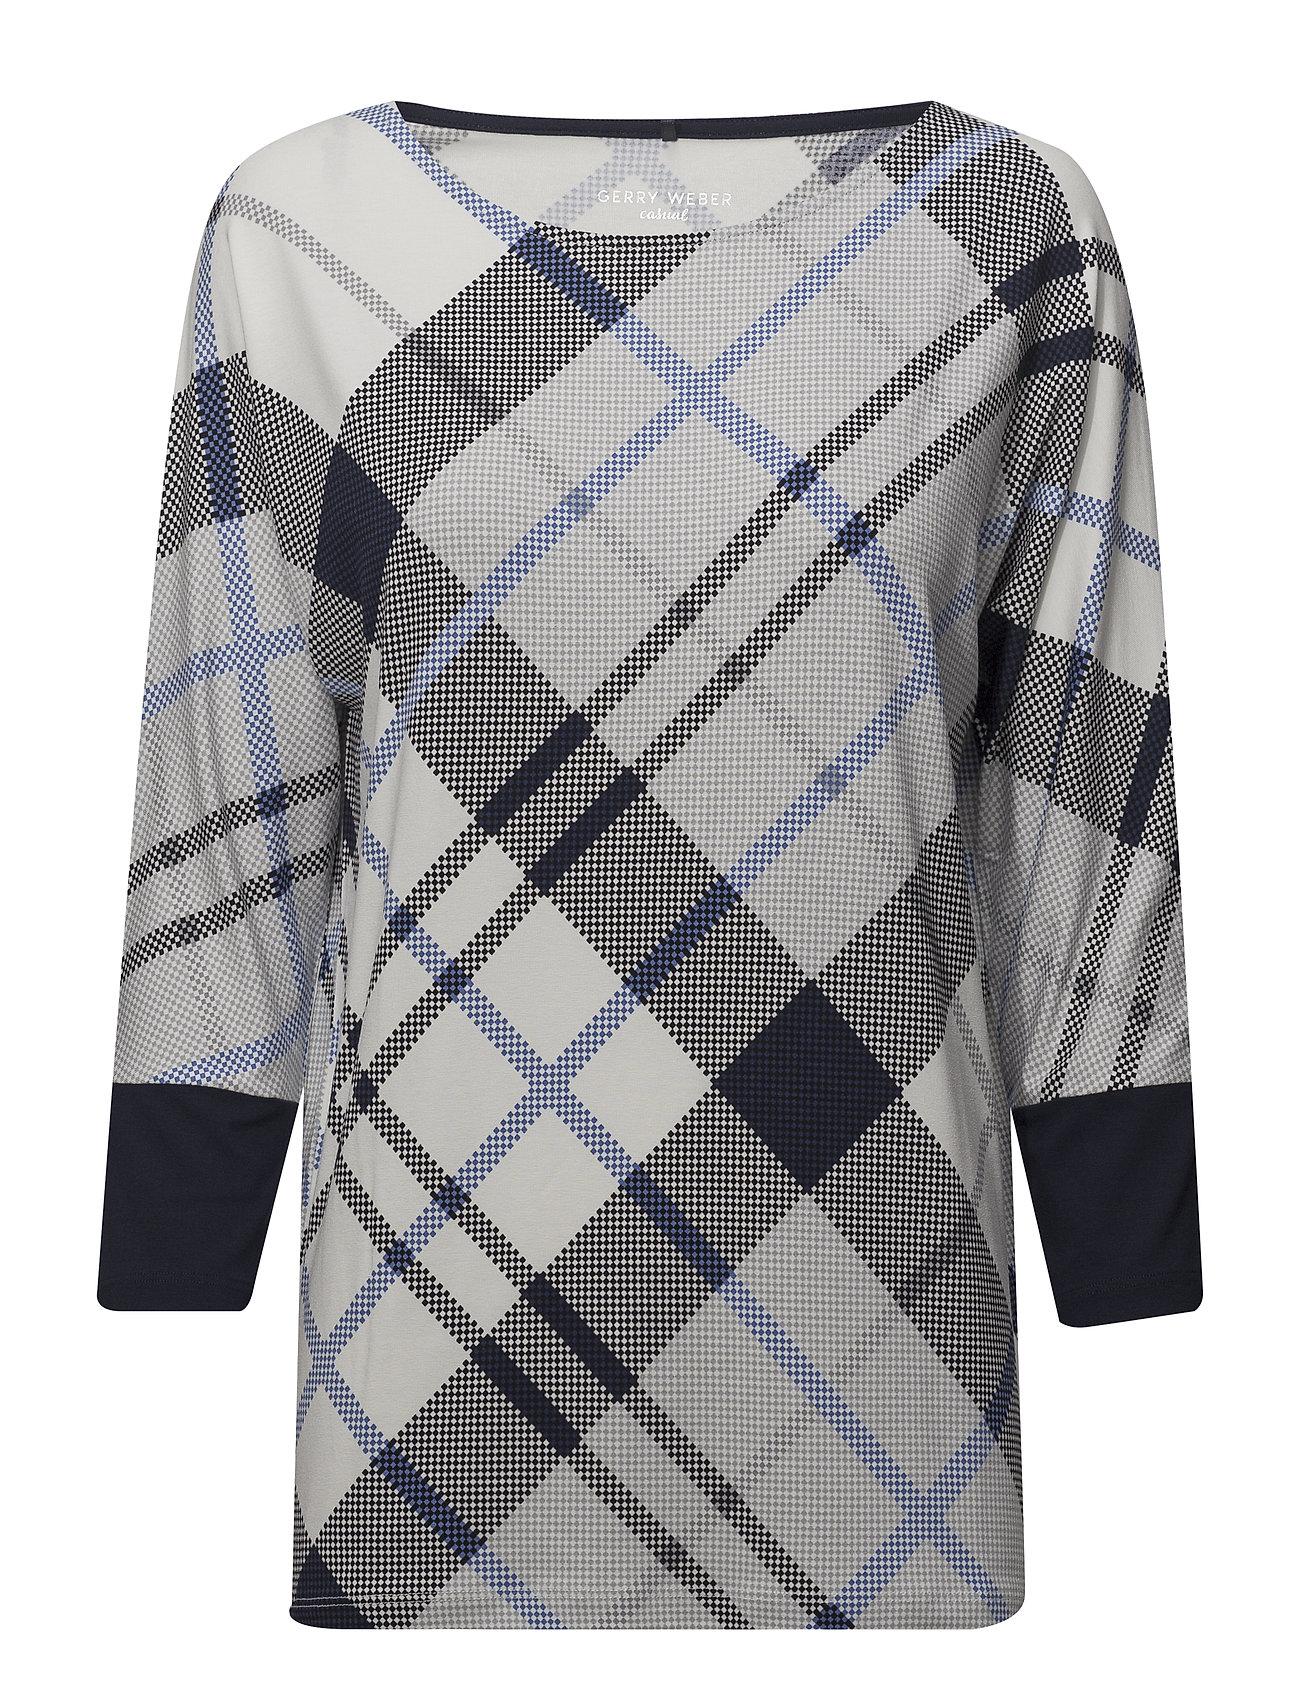 T-Shirt 3/4-Sleeve R - Gerry Weber Edition